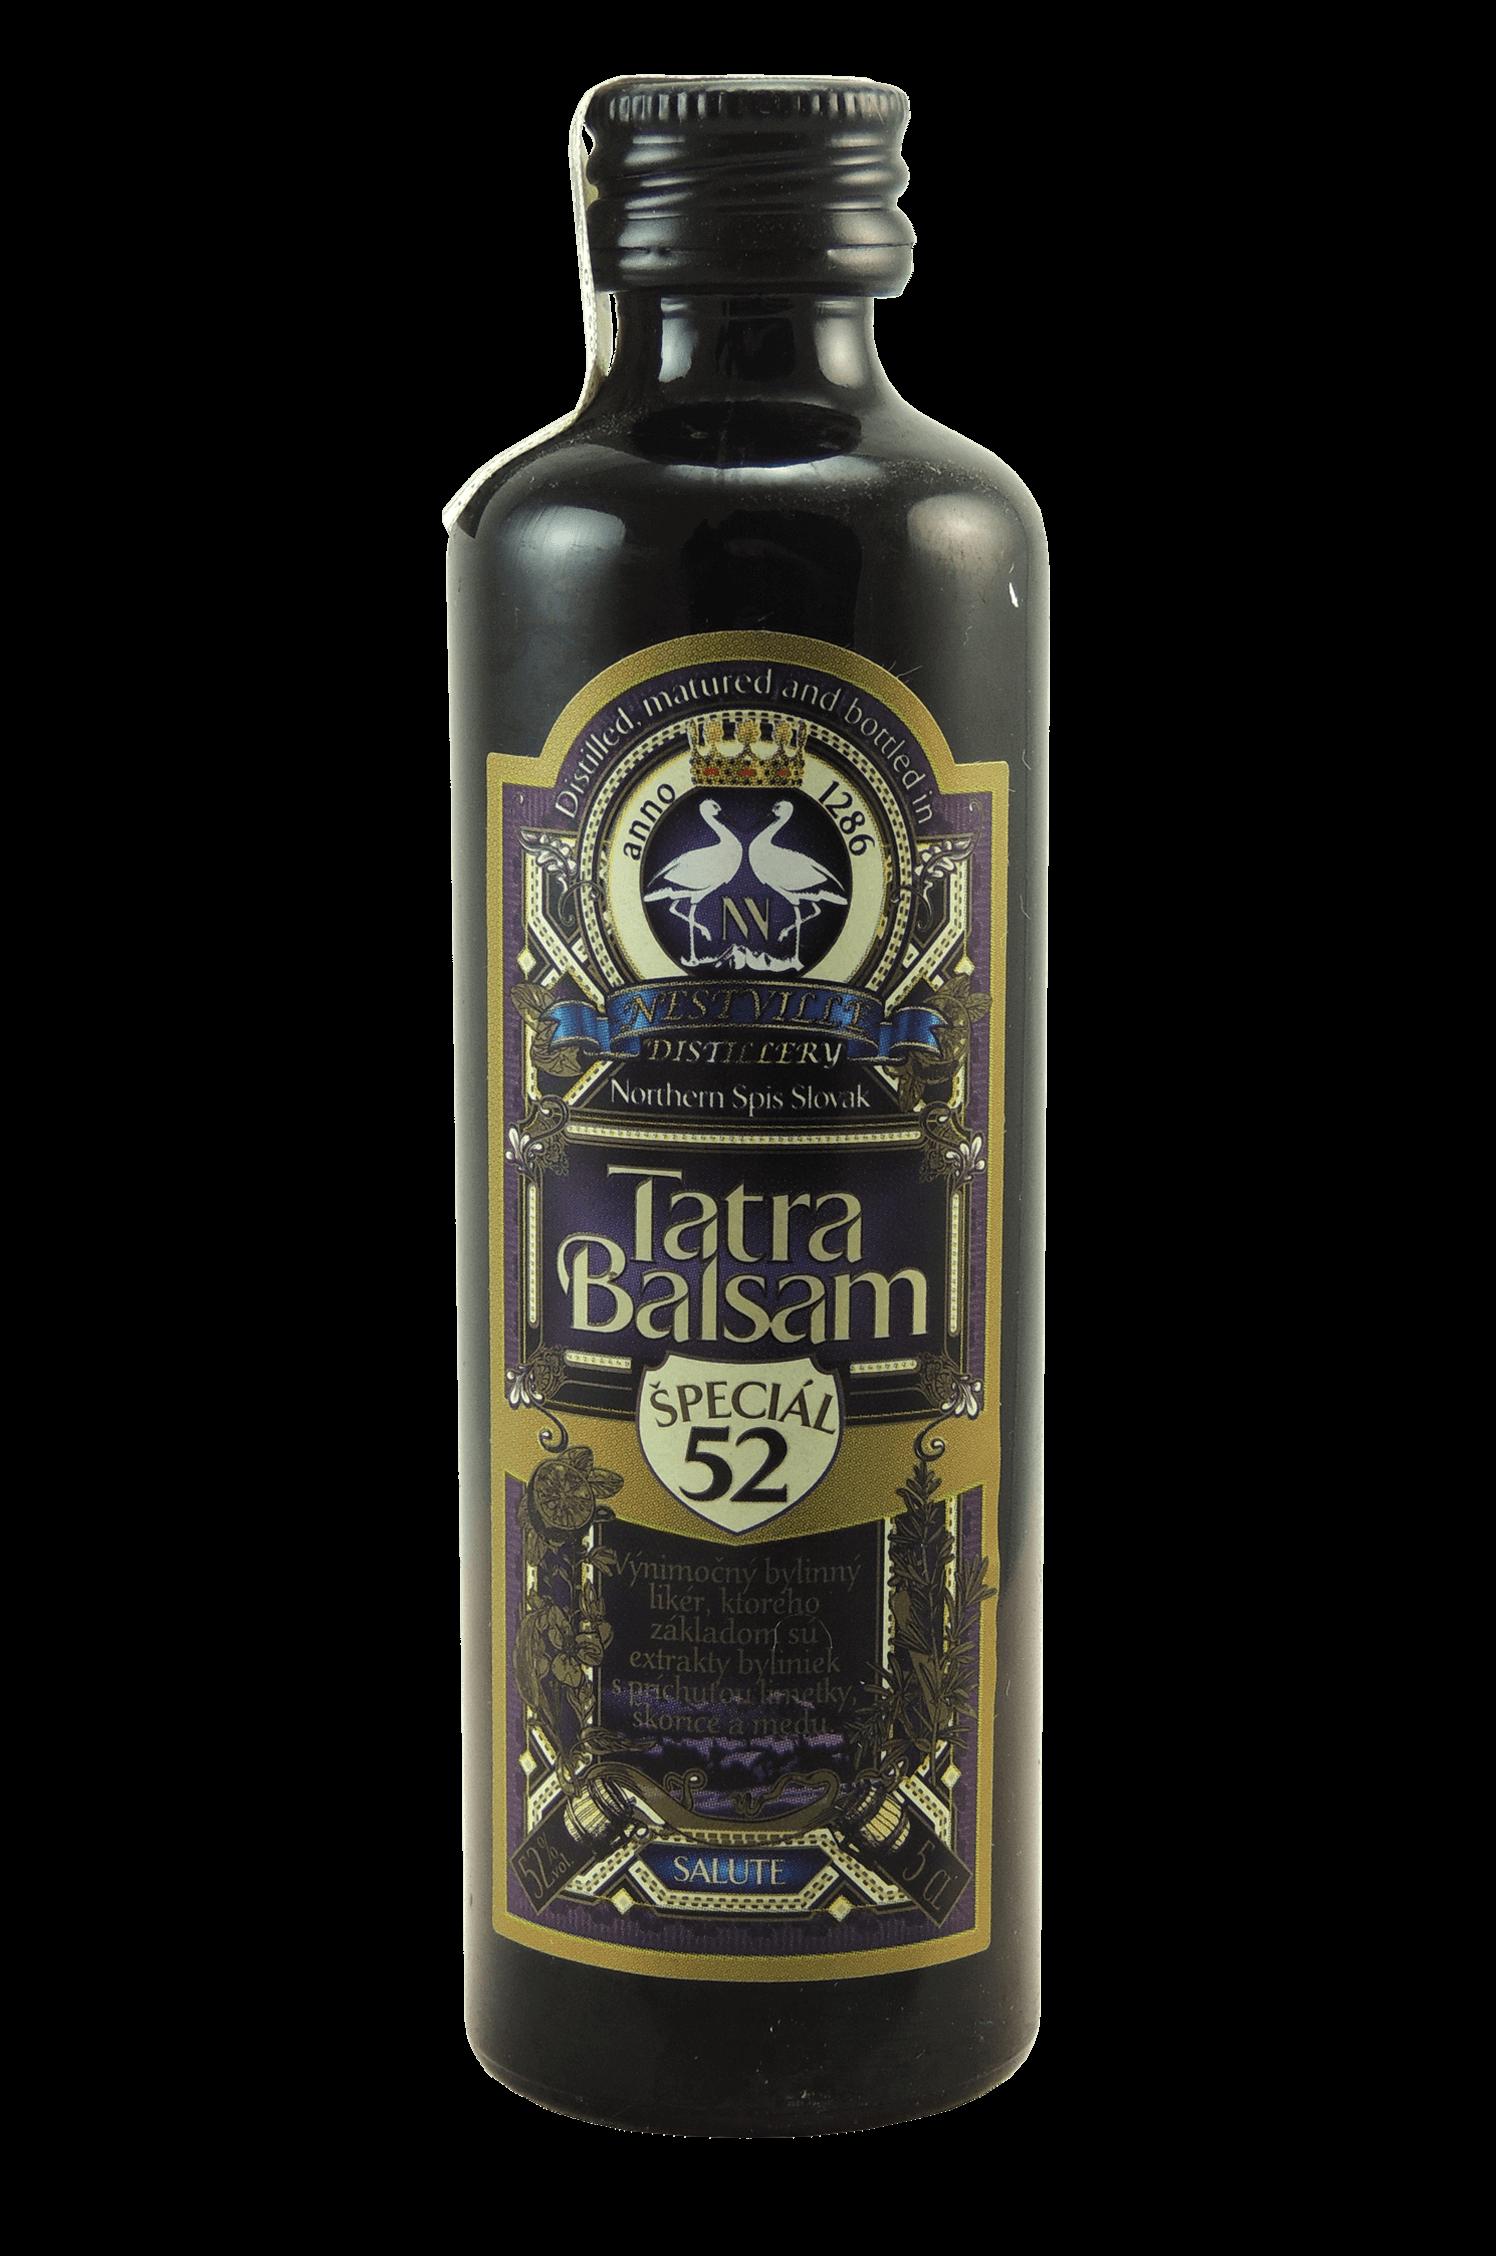 Tatra Balsam Špeciál 52